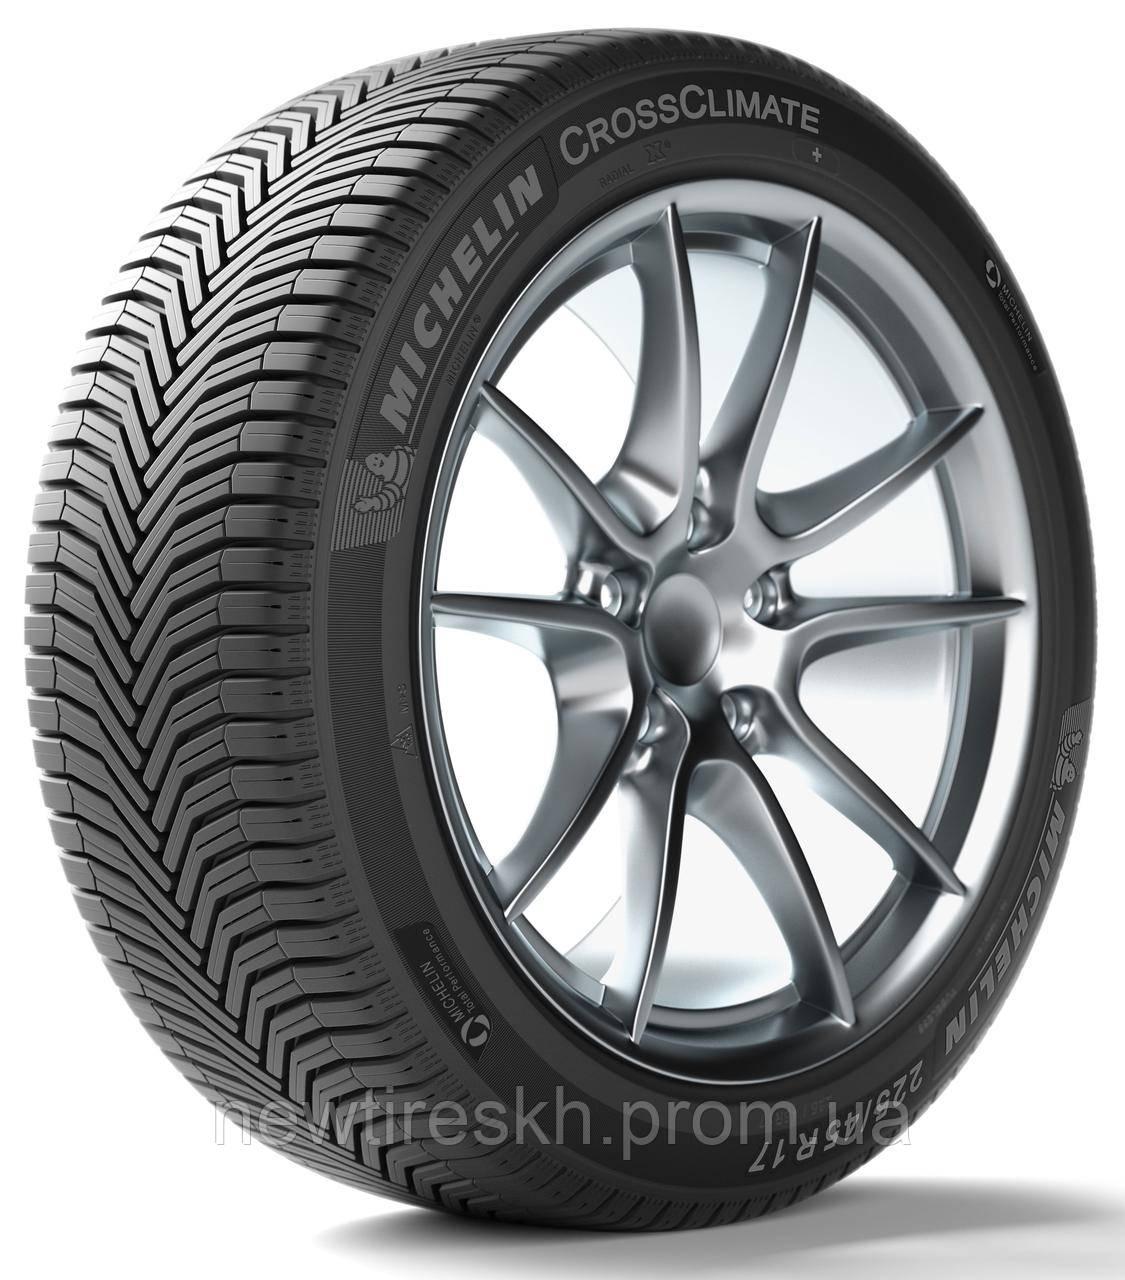 Michelin CrossClimate plus 185/65 R15 92T XL